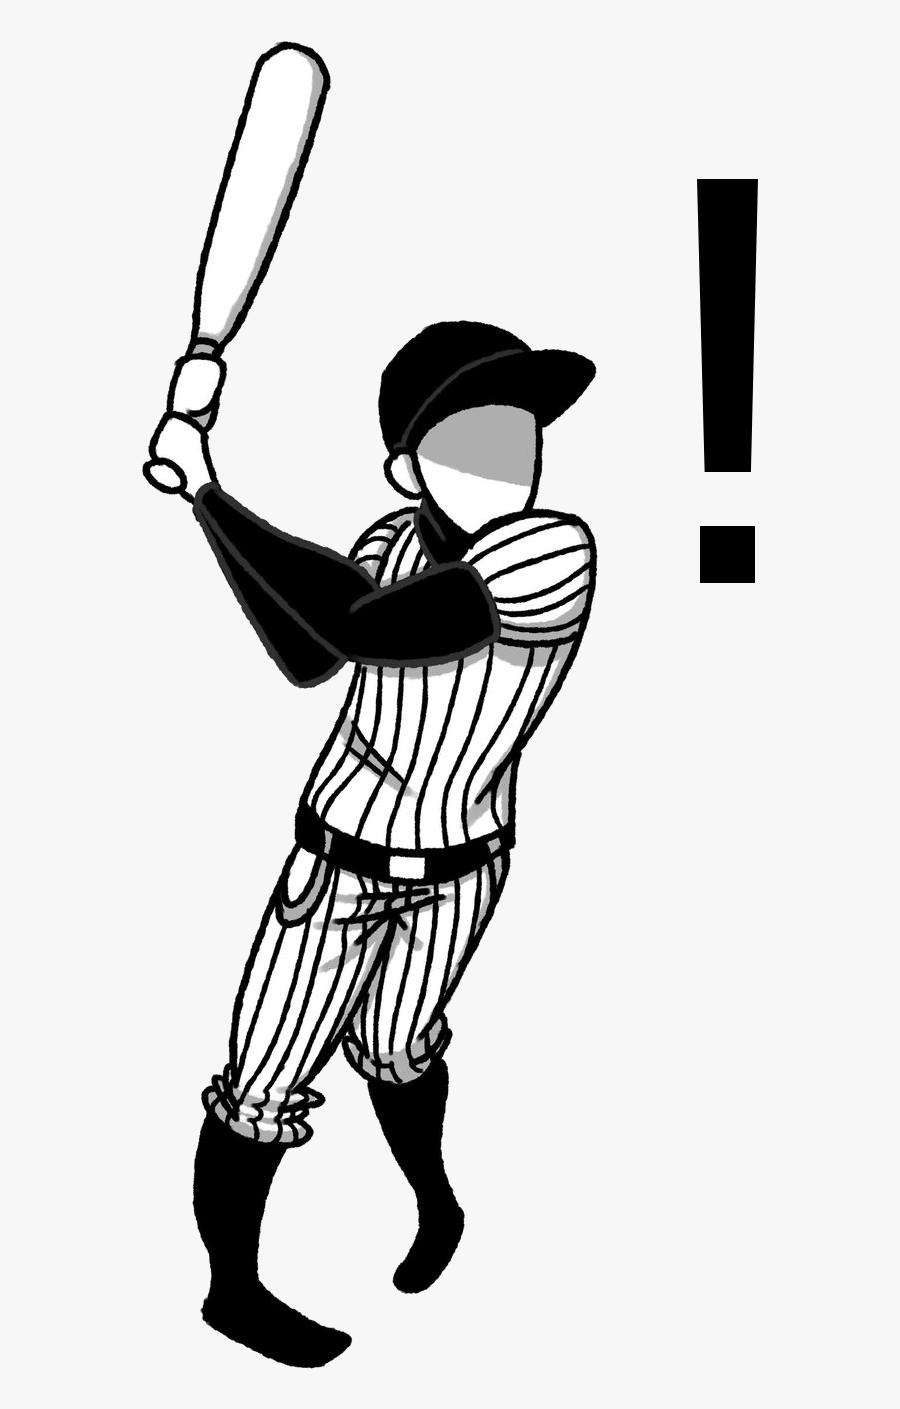 Baseball Player Swinging Bat Clip Art , Transparent , Free.